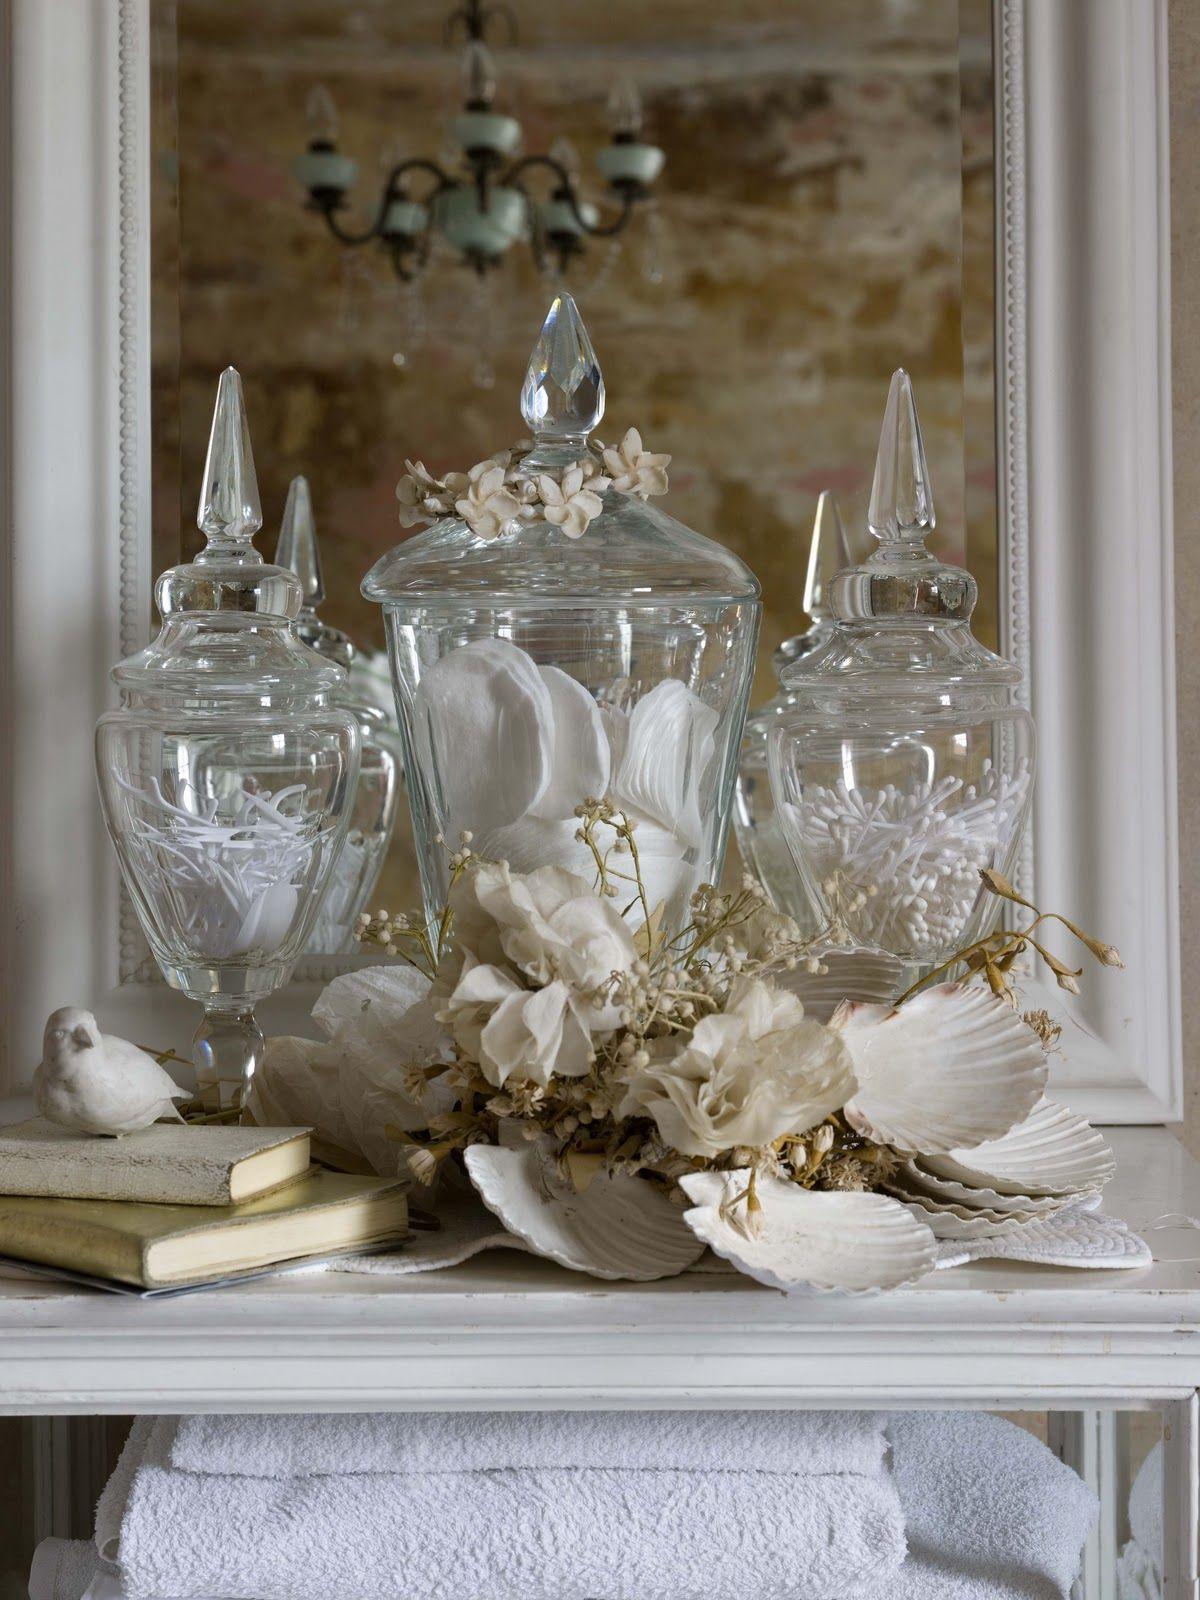 Seashells In Apothecary Jars Seashell Display